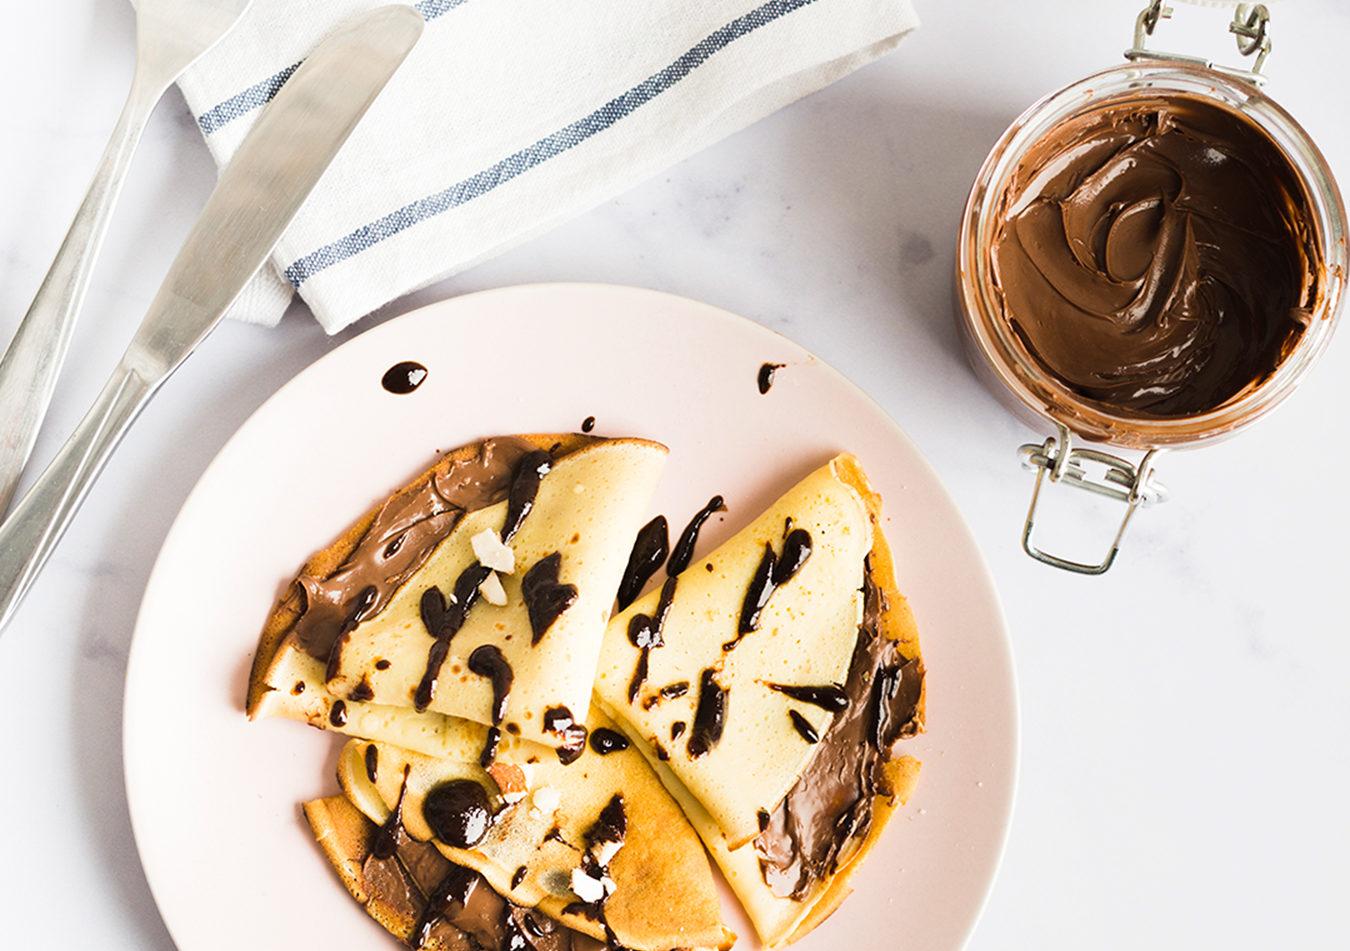 Receta proteica de Crepe con Chocolate